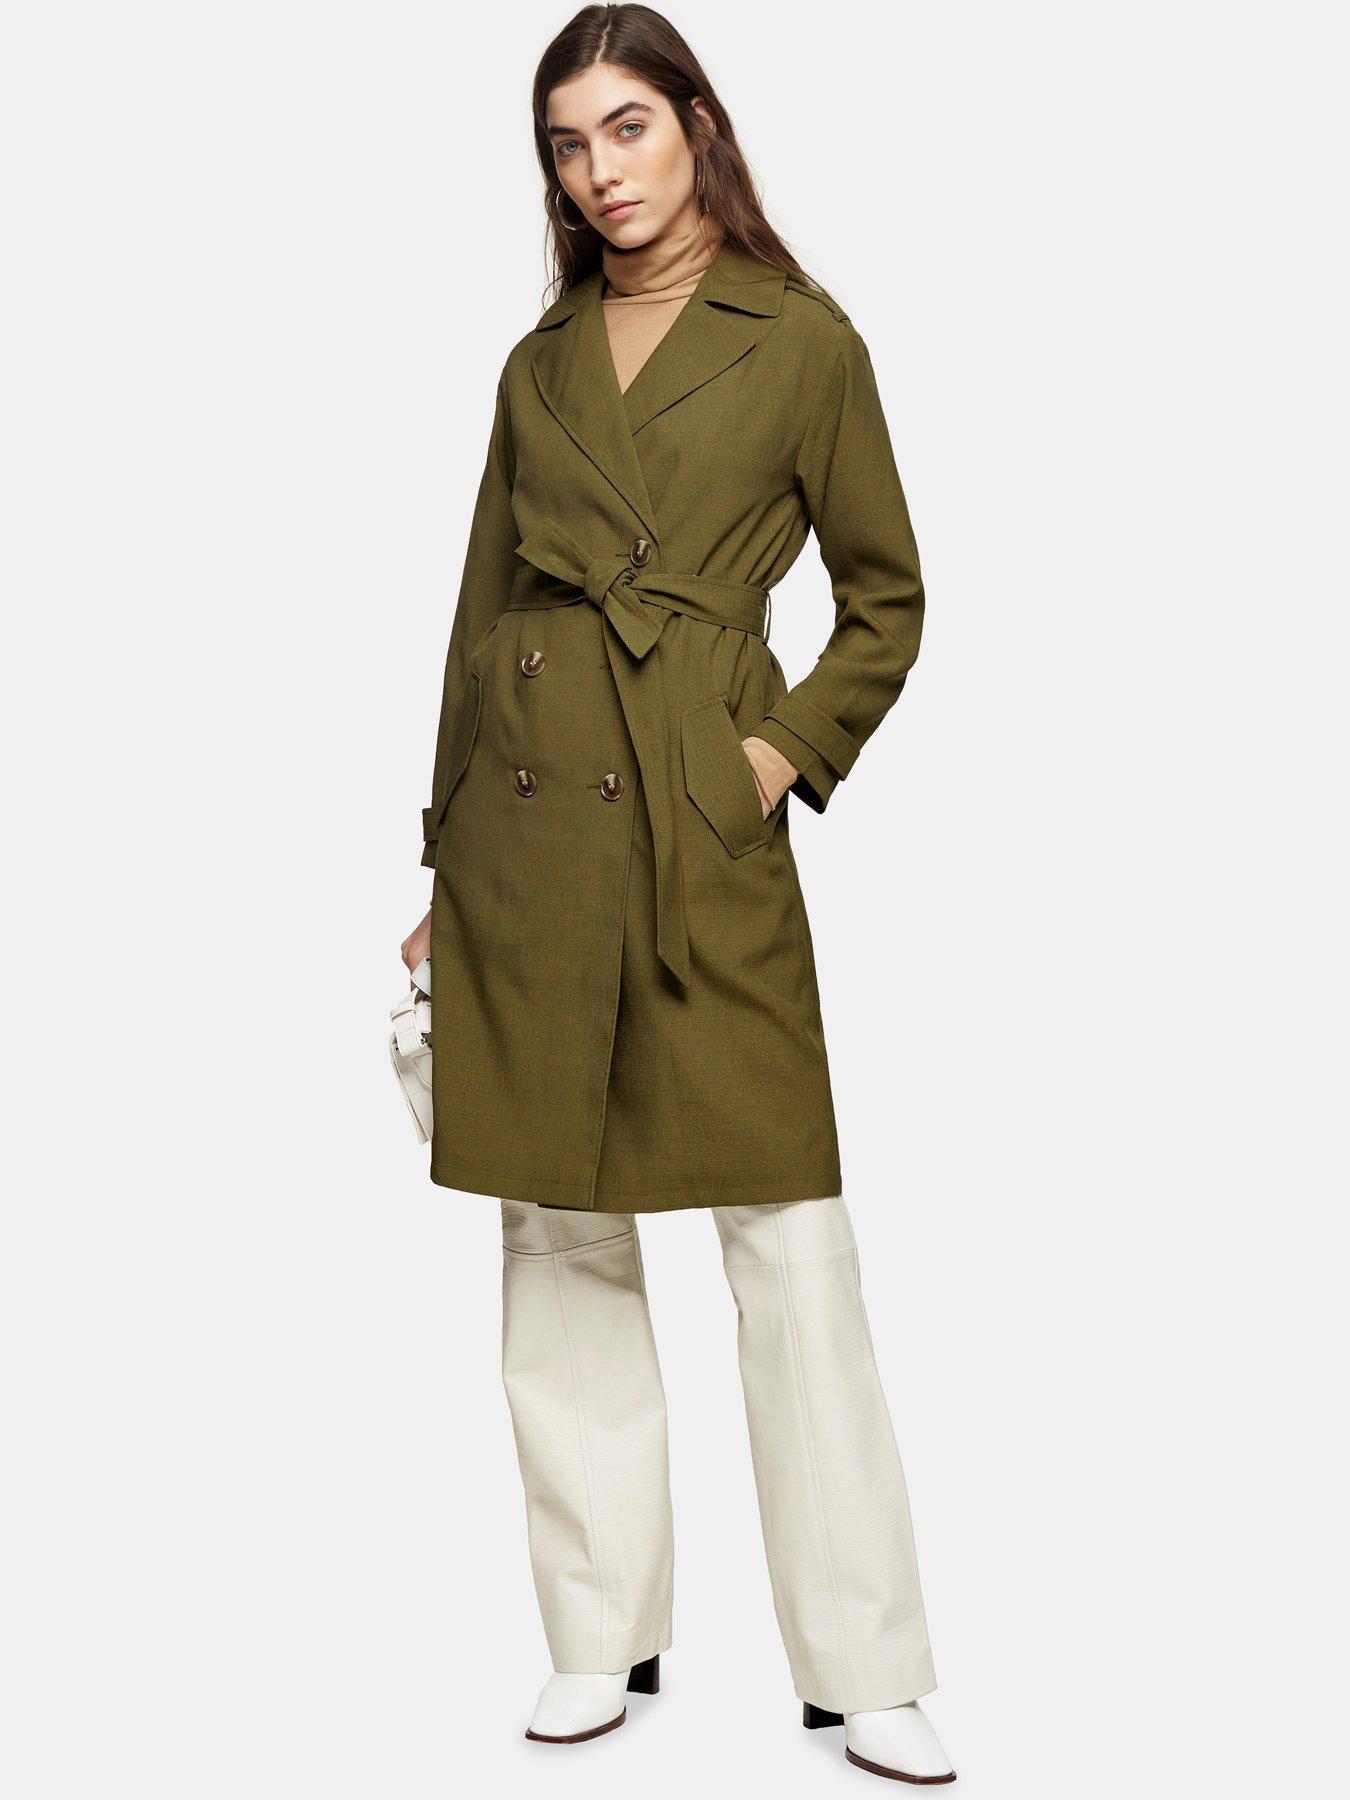 RRP£149 WRAP LONDON Mac Trench Coat Jacket Ecru Cream Cotton UK 8 10 12 14 16 22